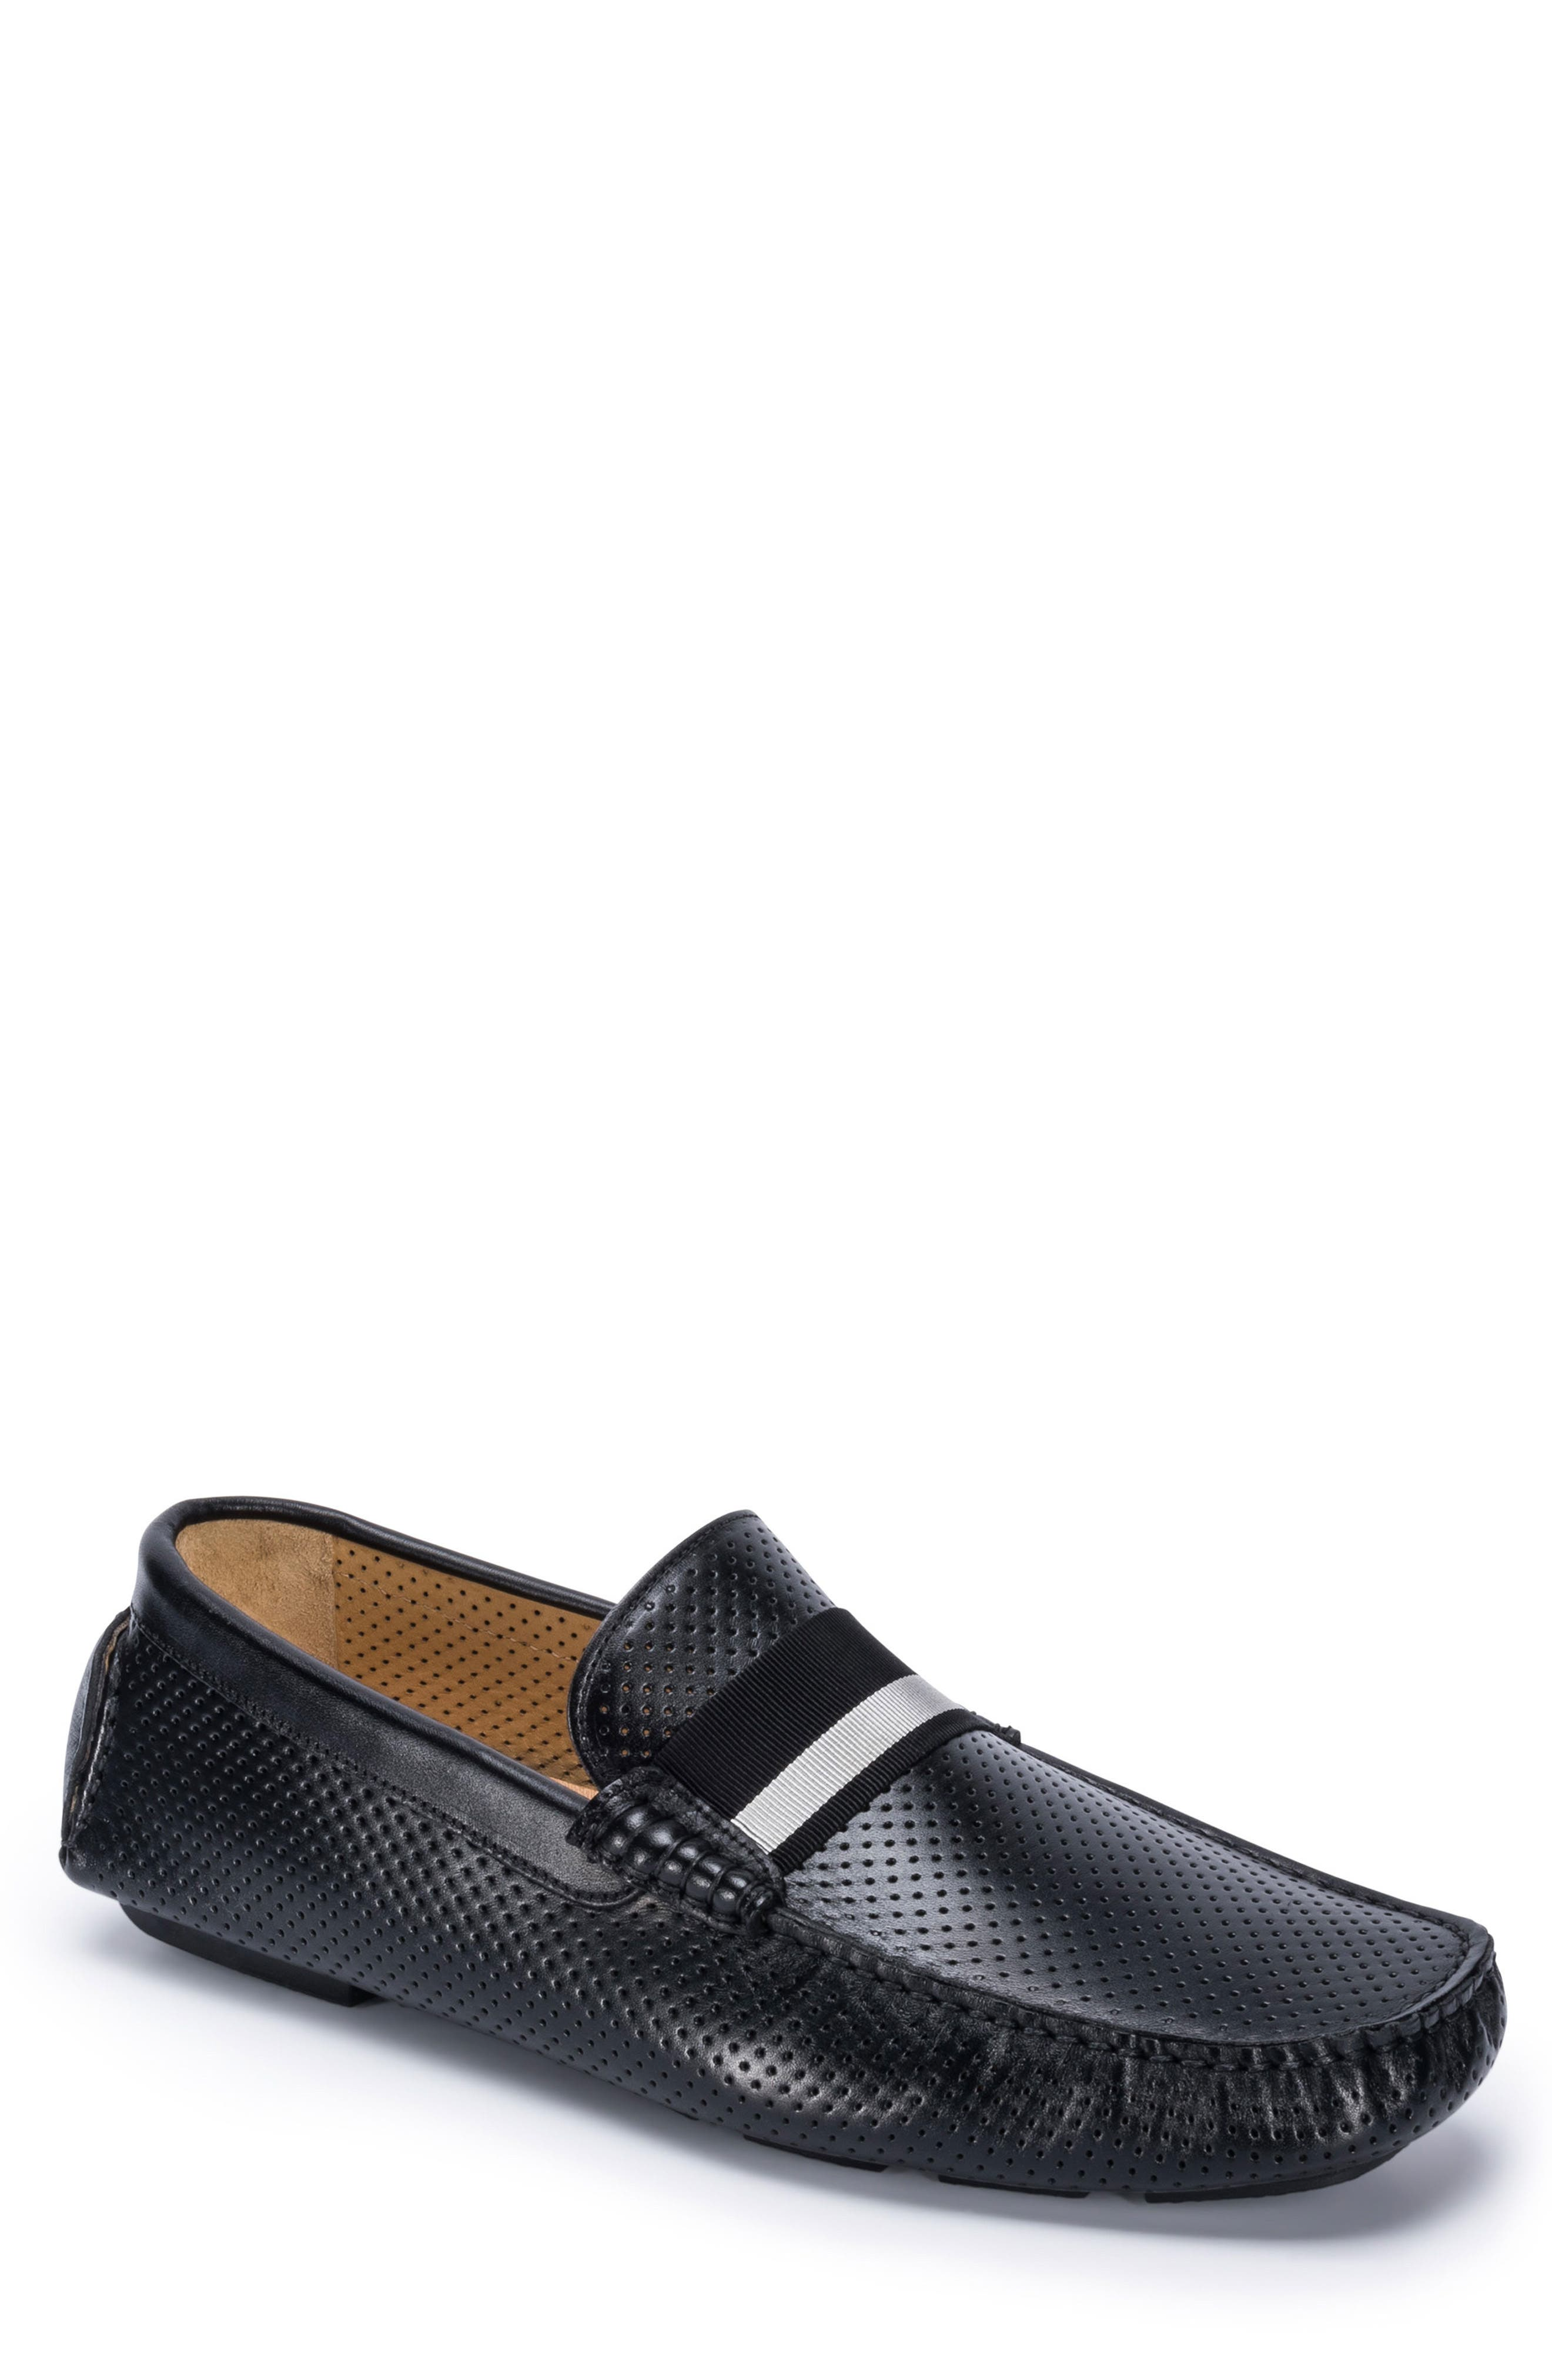 Sardegna Driving Shoe,                         Main,                         color, BLACK